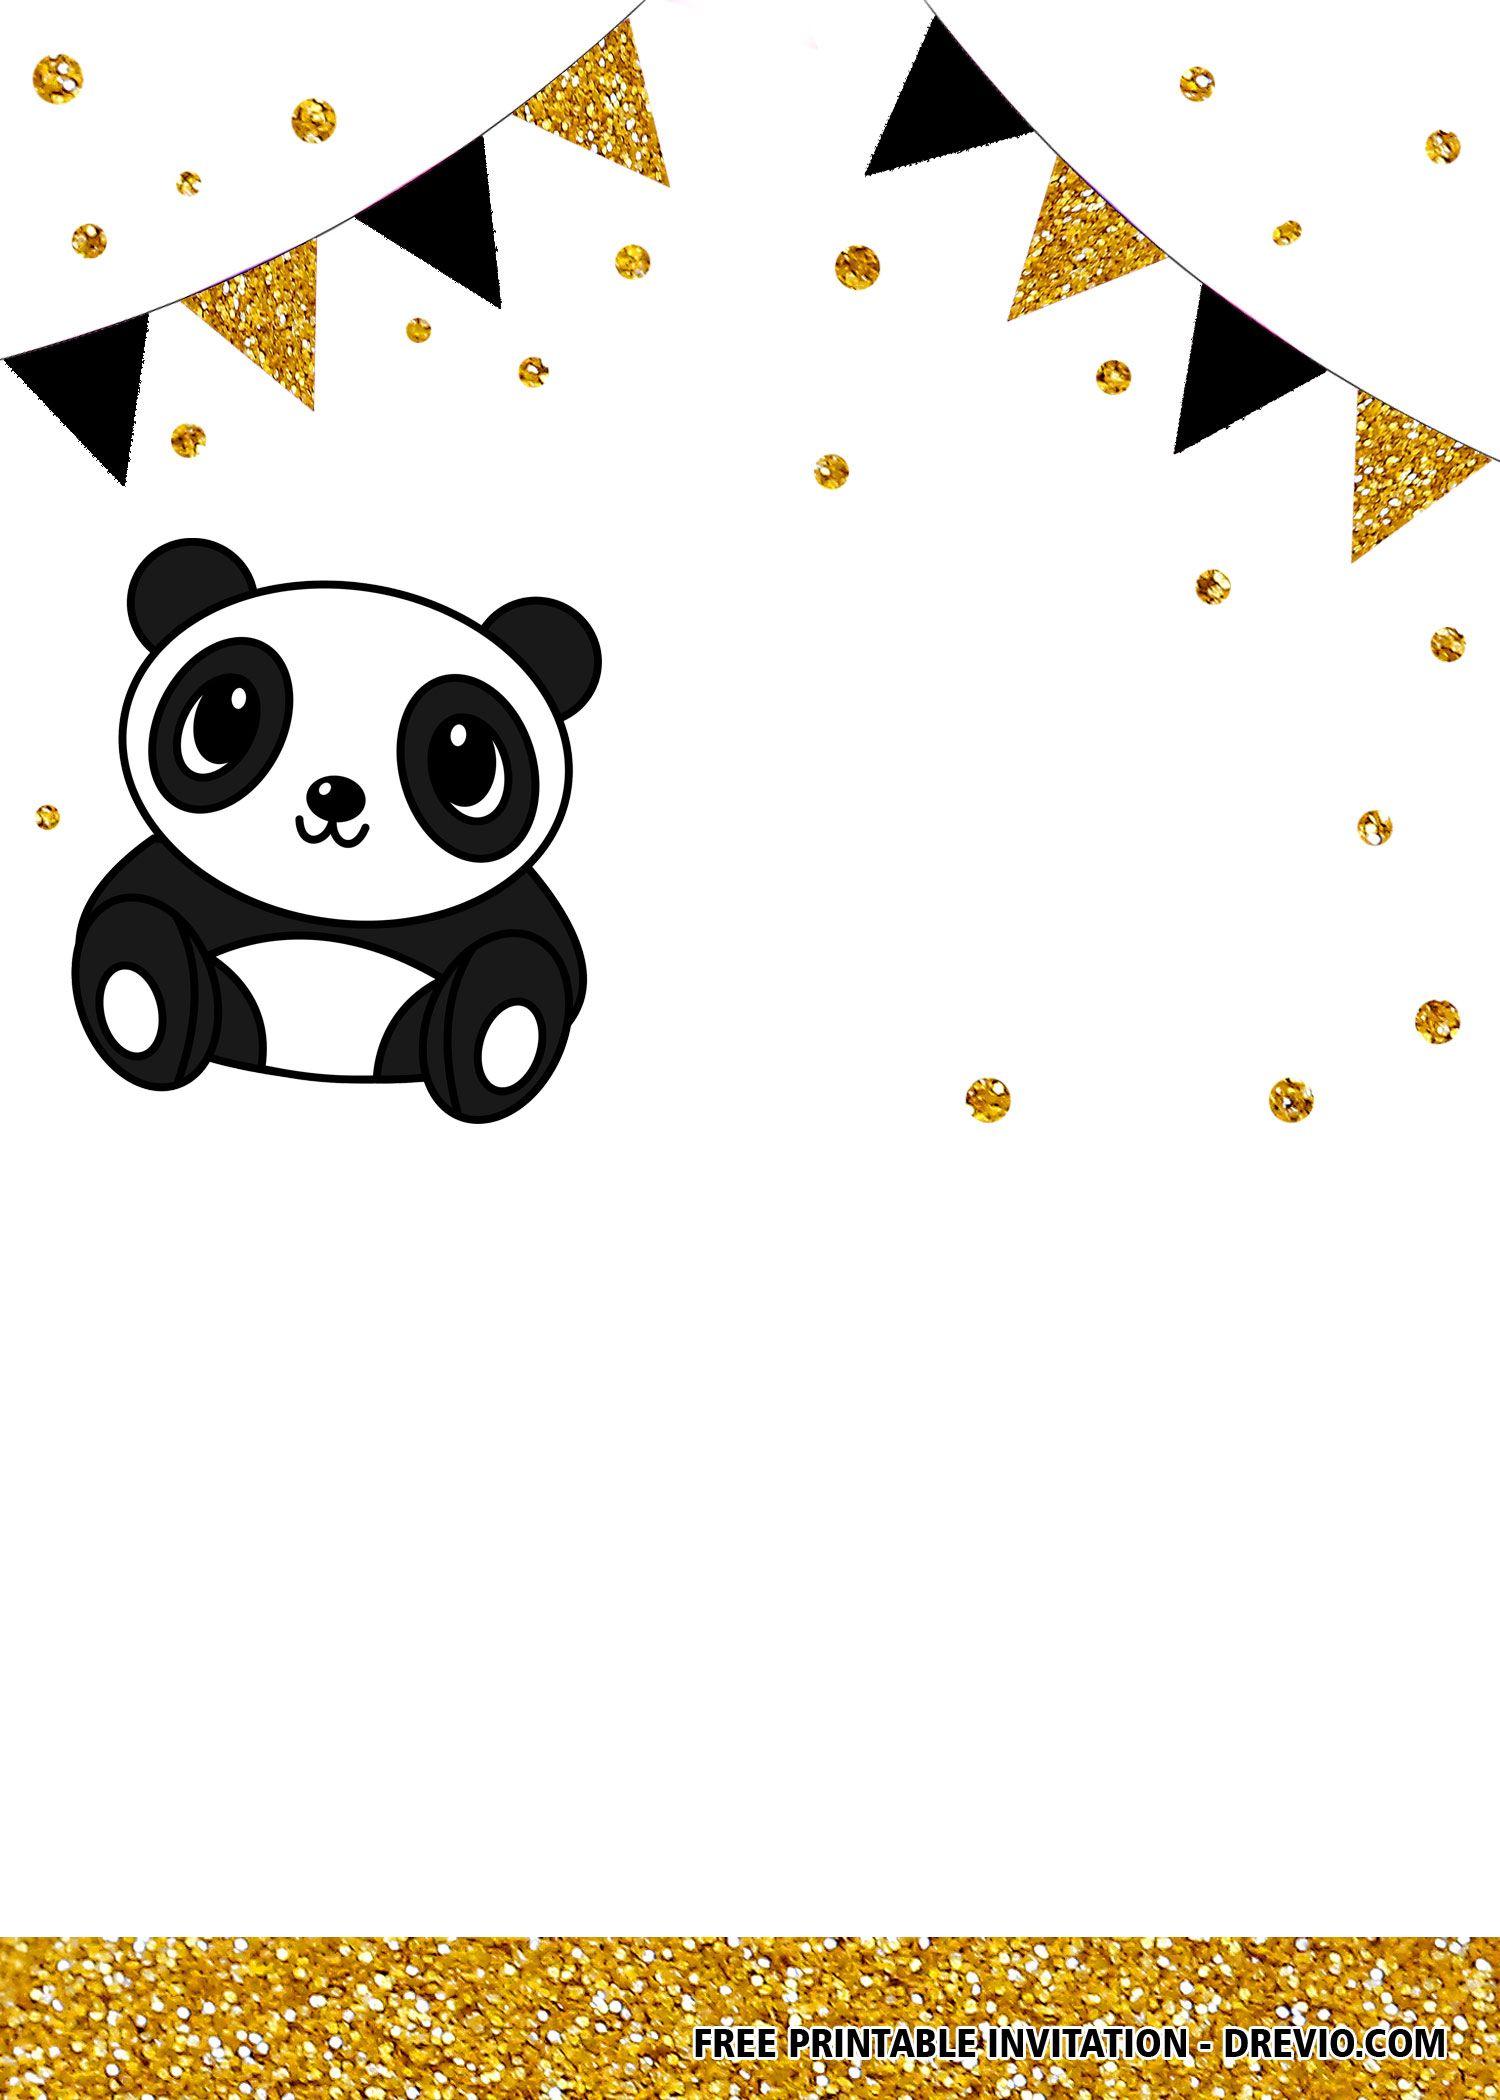 Free Printable Panda Birthday Invitation Templates Panda Birthday Invitations Panda Birthday Cards Panda Birthday